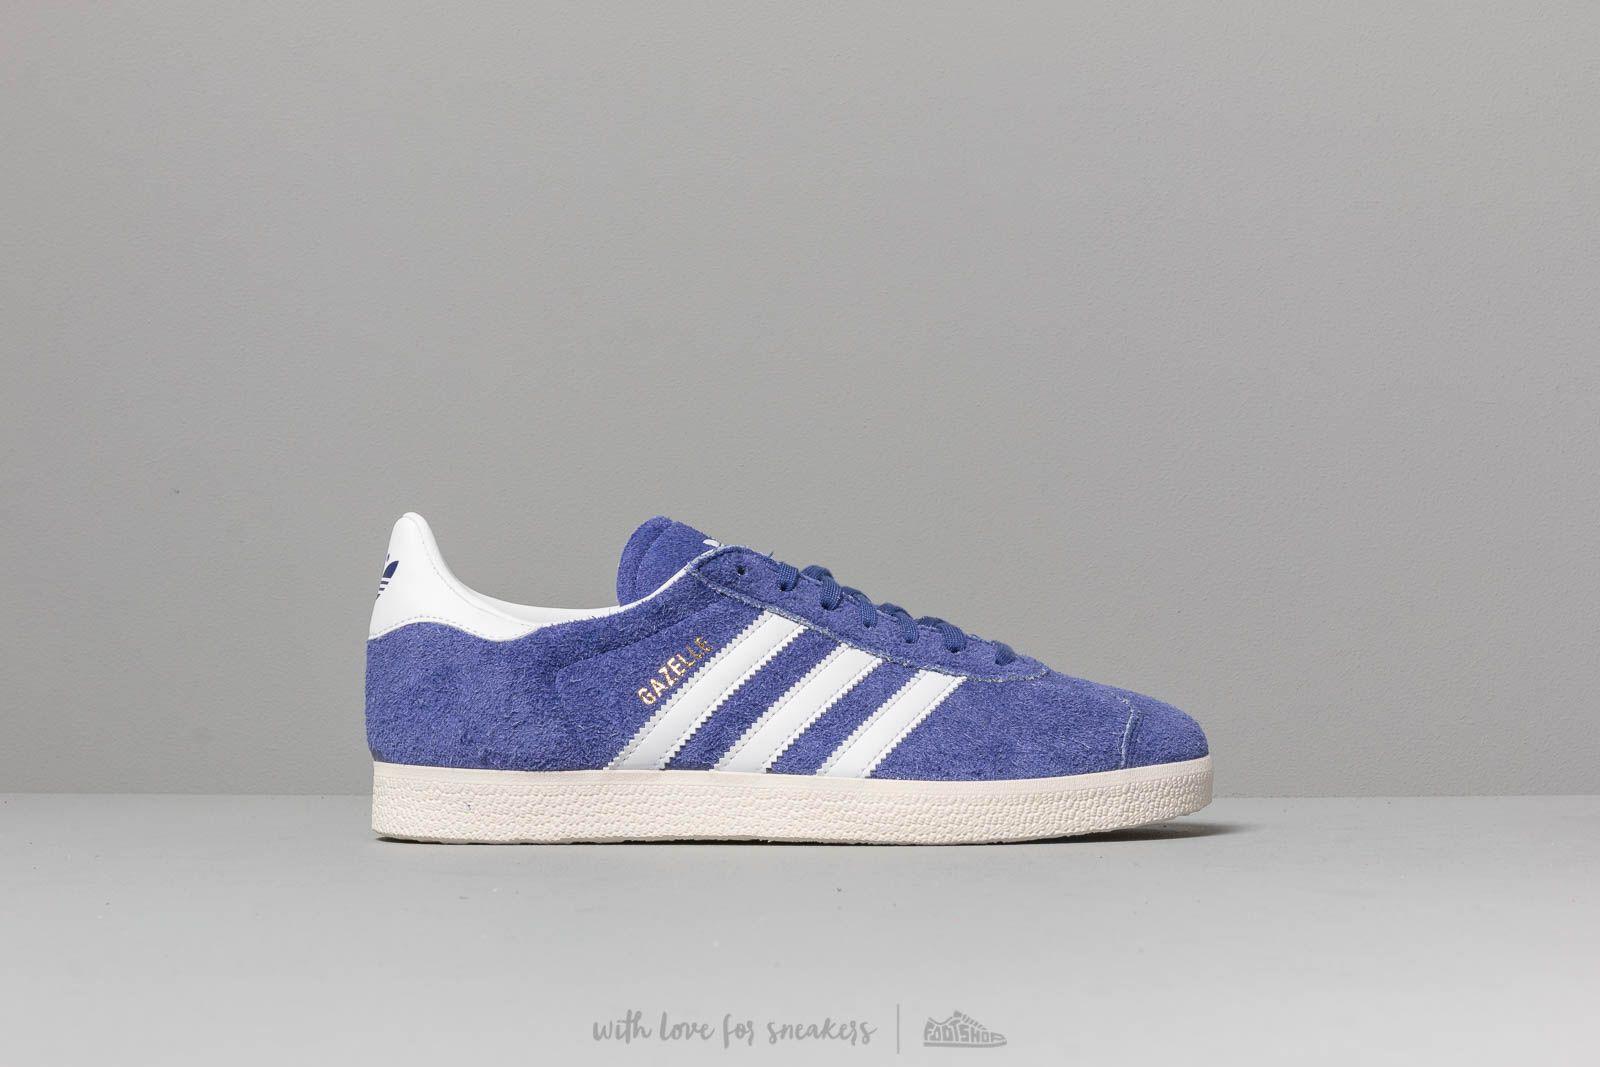 adidas Gazelle Active Blue Ftw White Off White | Footshop